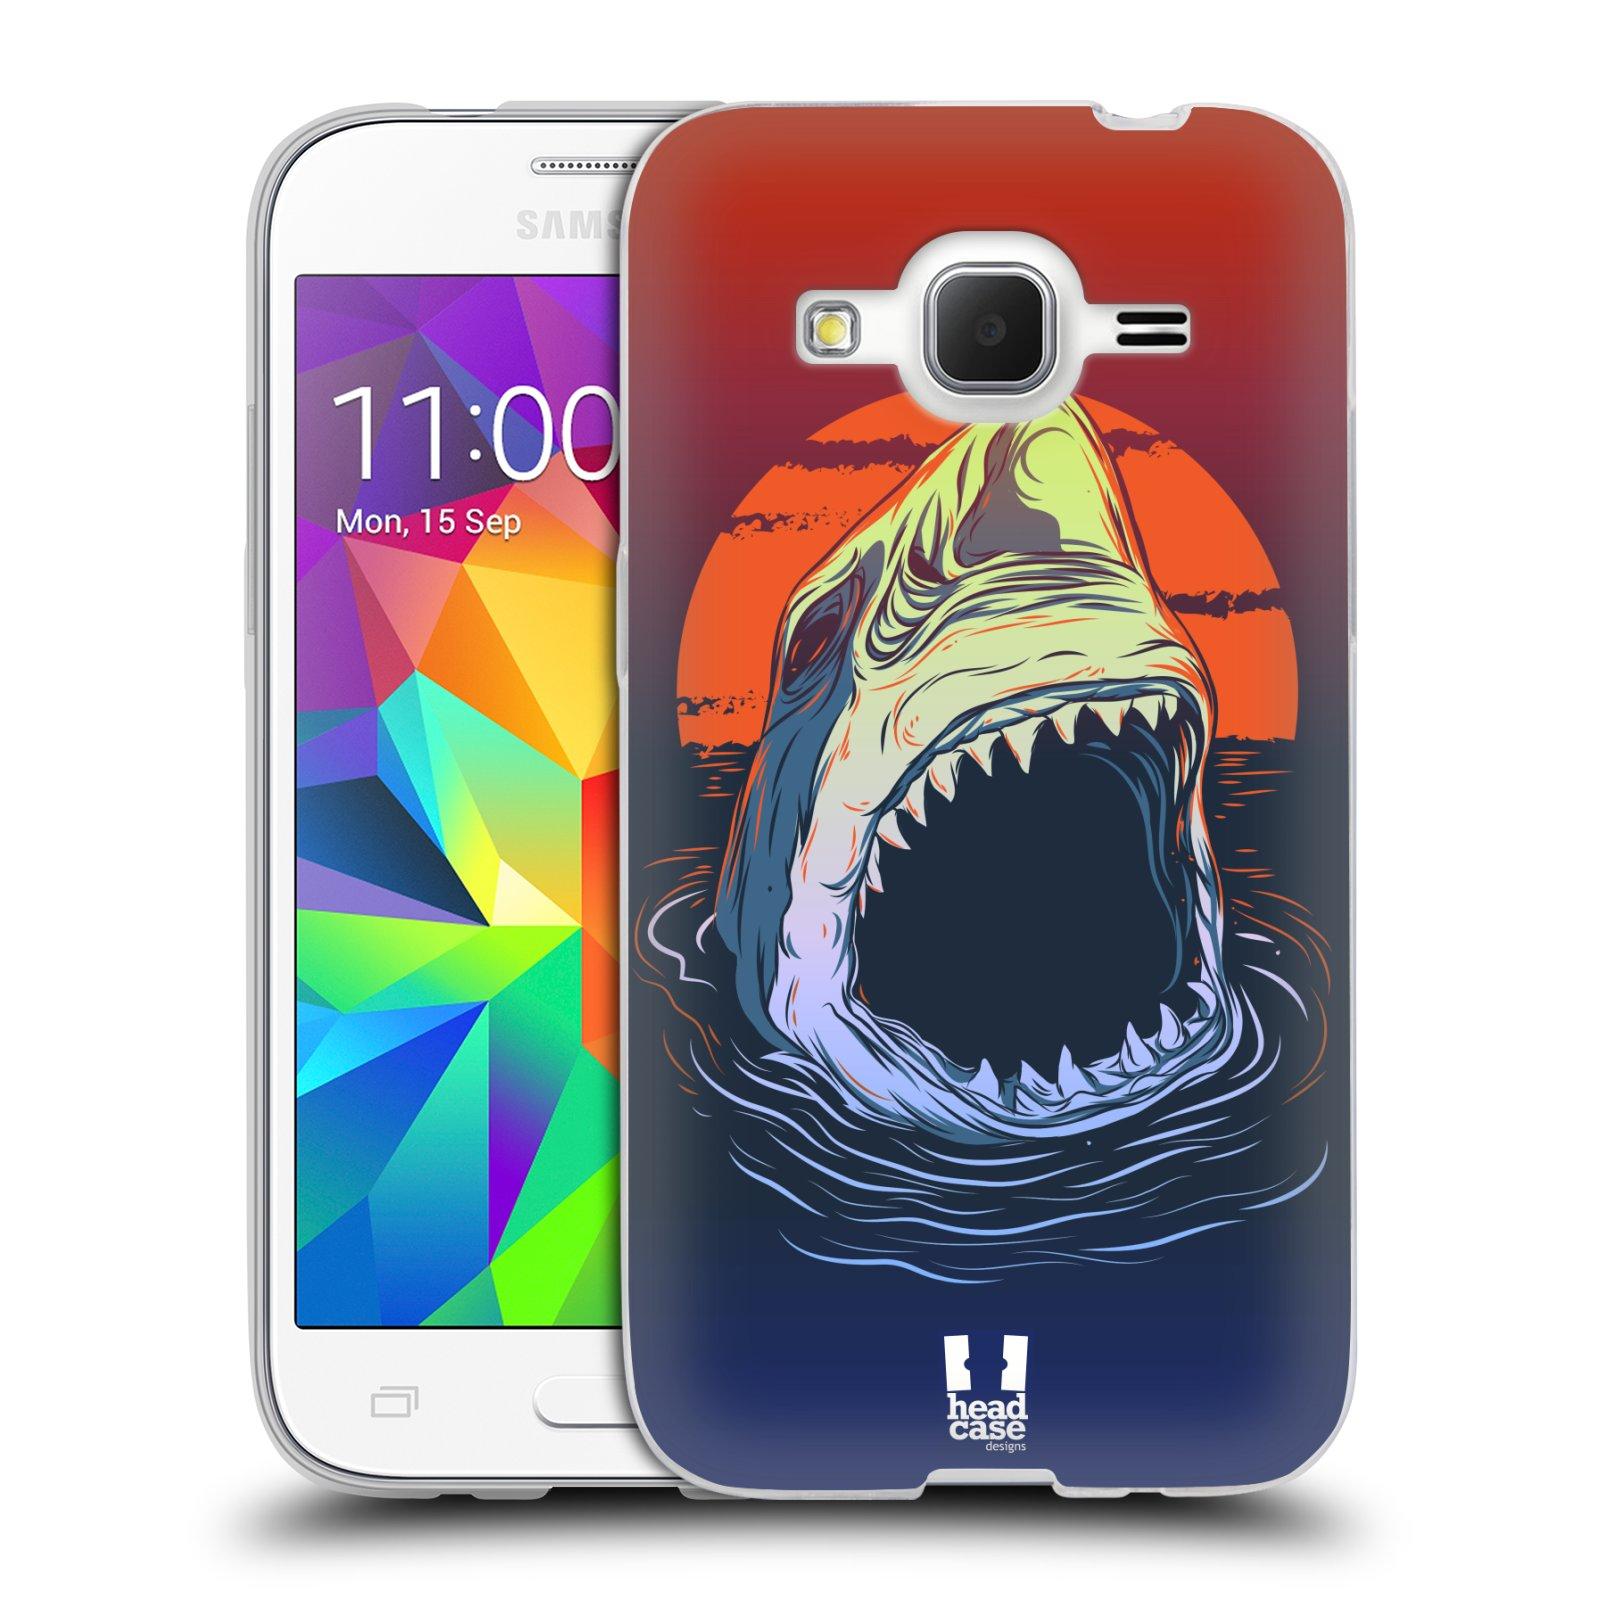 Silikonové pouzdro na mobil Samsung Galaxy Core Prime LTE HEAD CASE HLADOVÝ ŽRALOK (Silikonový kryt či obal na mobilní telefon Samsung Galaxy Core Prime LTE SM-G360)